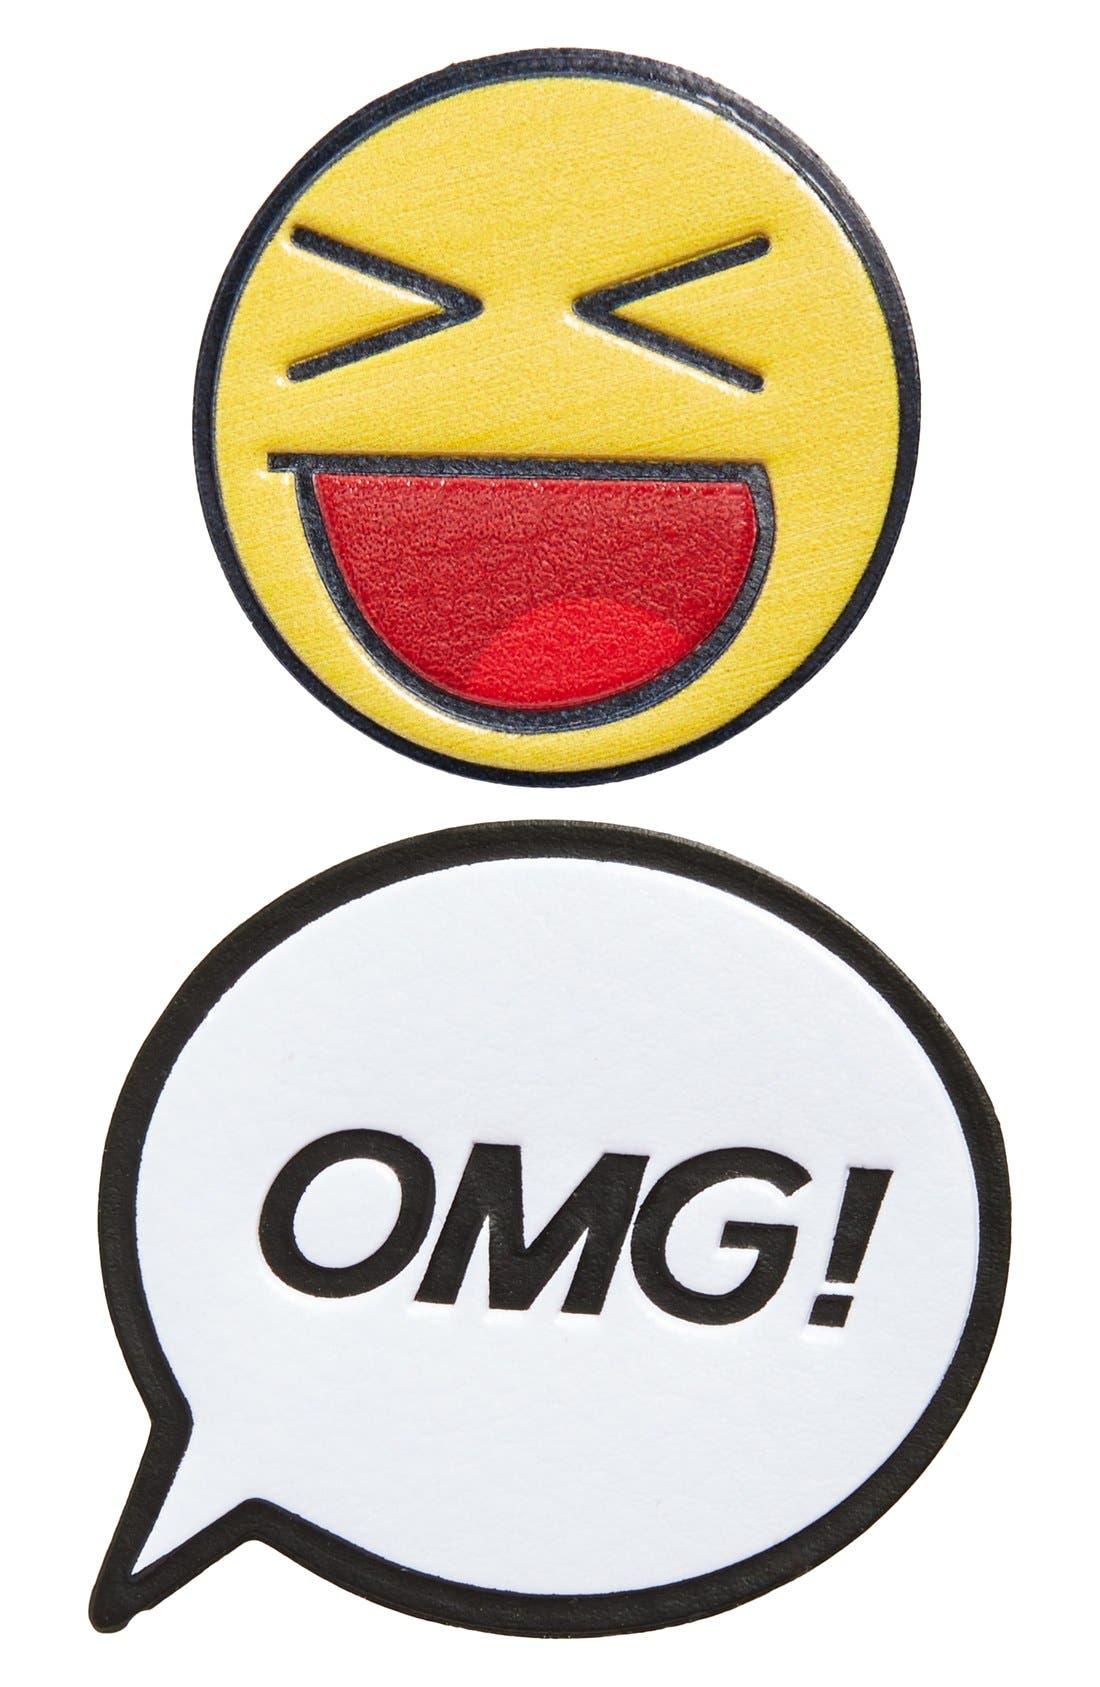 Alternate Image 1 Selected - Skinnydip 'OMG!' Plushie Stickers (Set of 2)